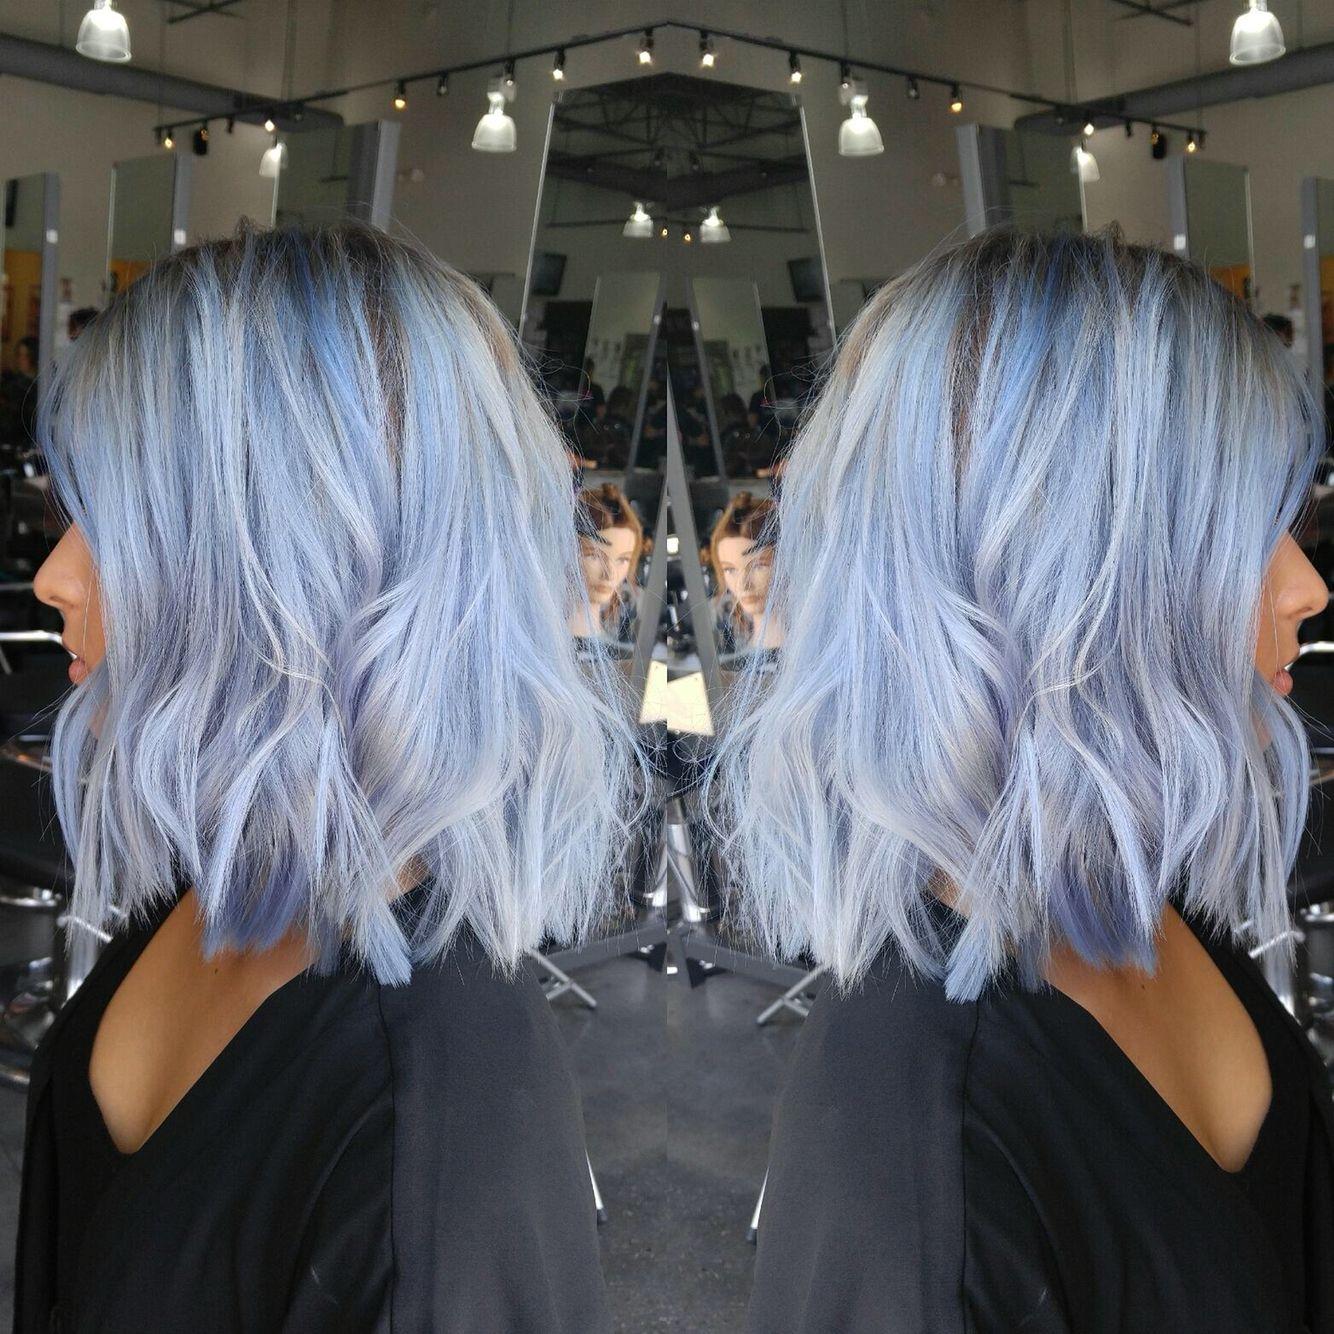 Shark Blue By Ion Over Wella T14 Toner Blue Hair Silver Hair Fashion Colors Vivid Hair Color Pastel Hair Color Vivid Hair Color Silver Hair Color Hair Styles